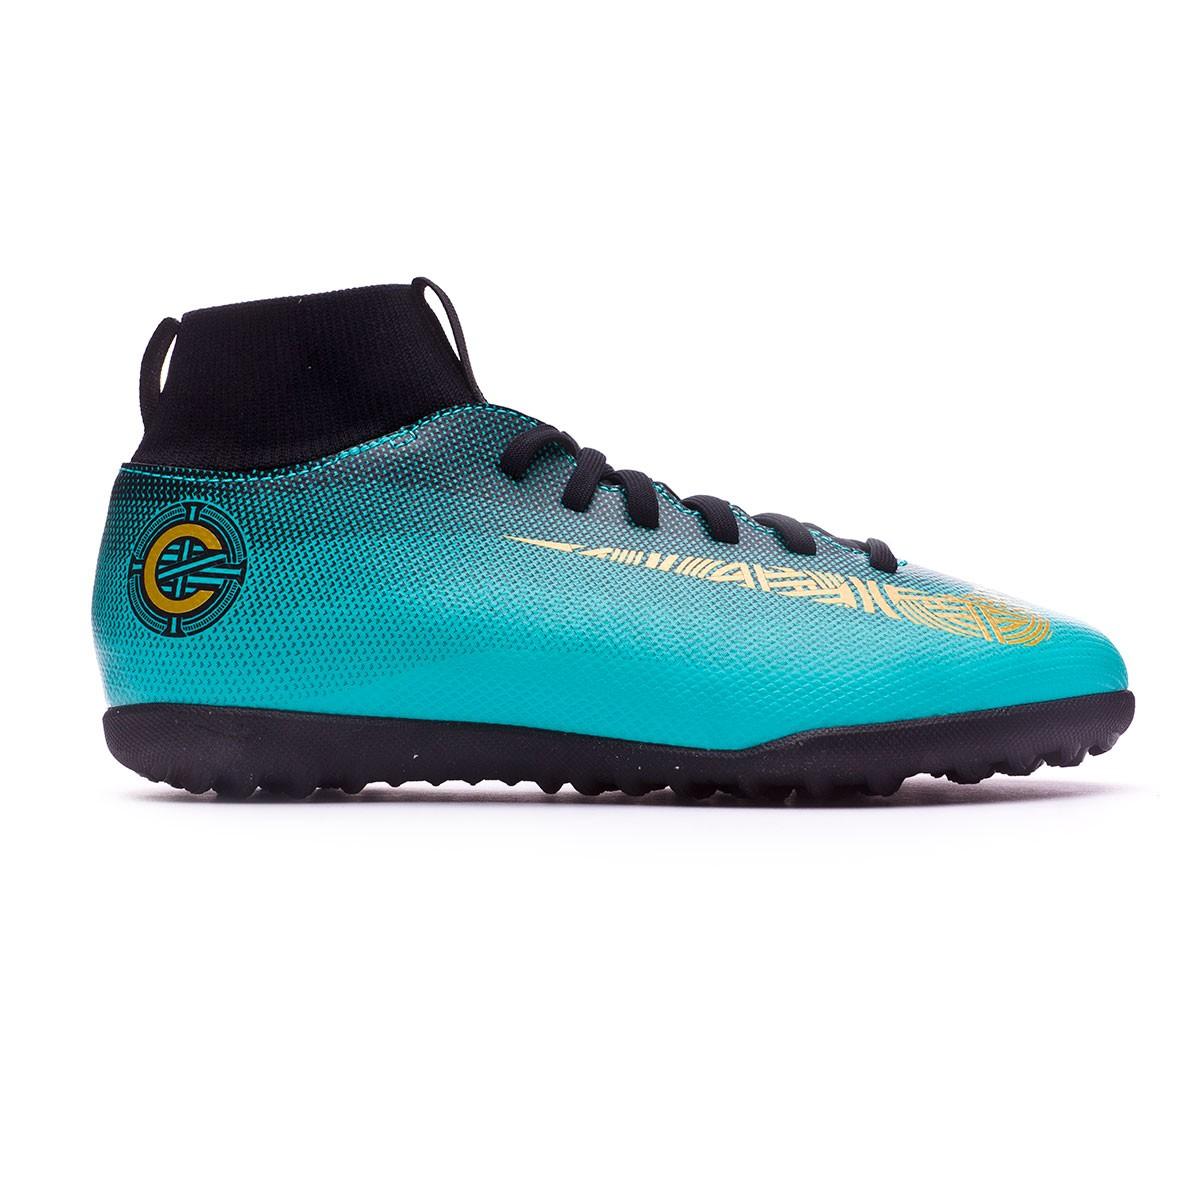 a2d2eabbfdb Sapatilhas Nike Mercurial SuperflyX VI Club CR7 Turf Crianças Clear  jade-Metallic vivid gold-Black - Loja de futebol Fútbol Emotion